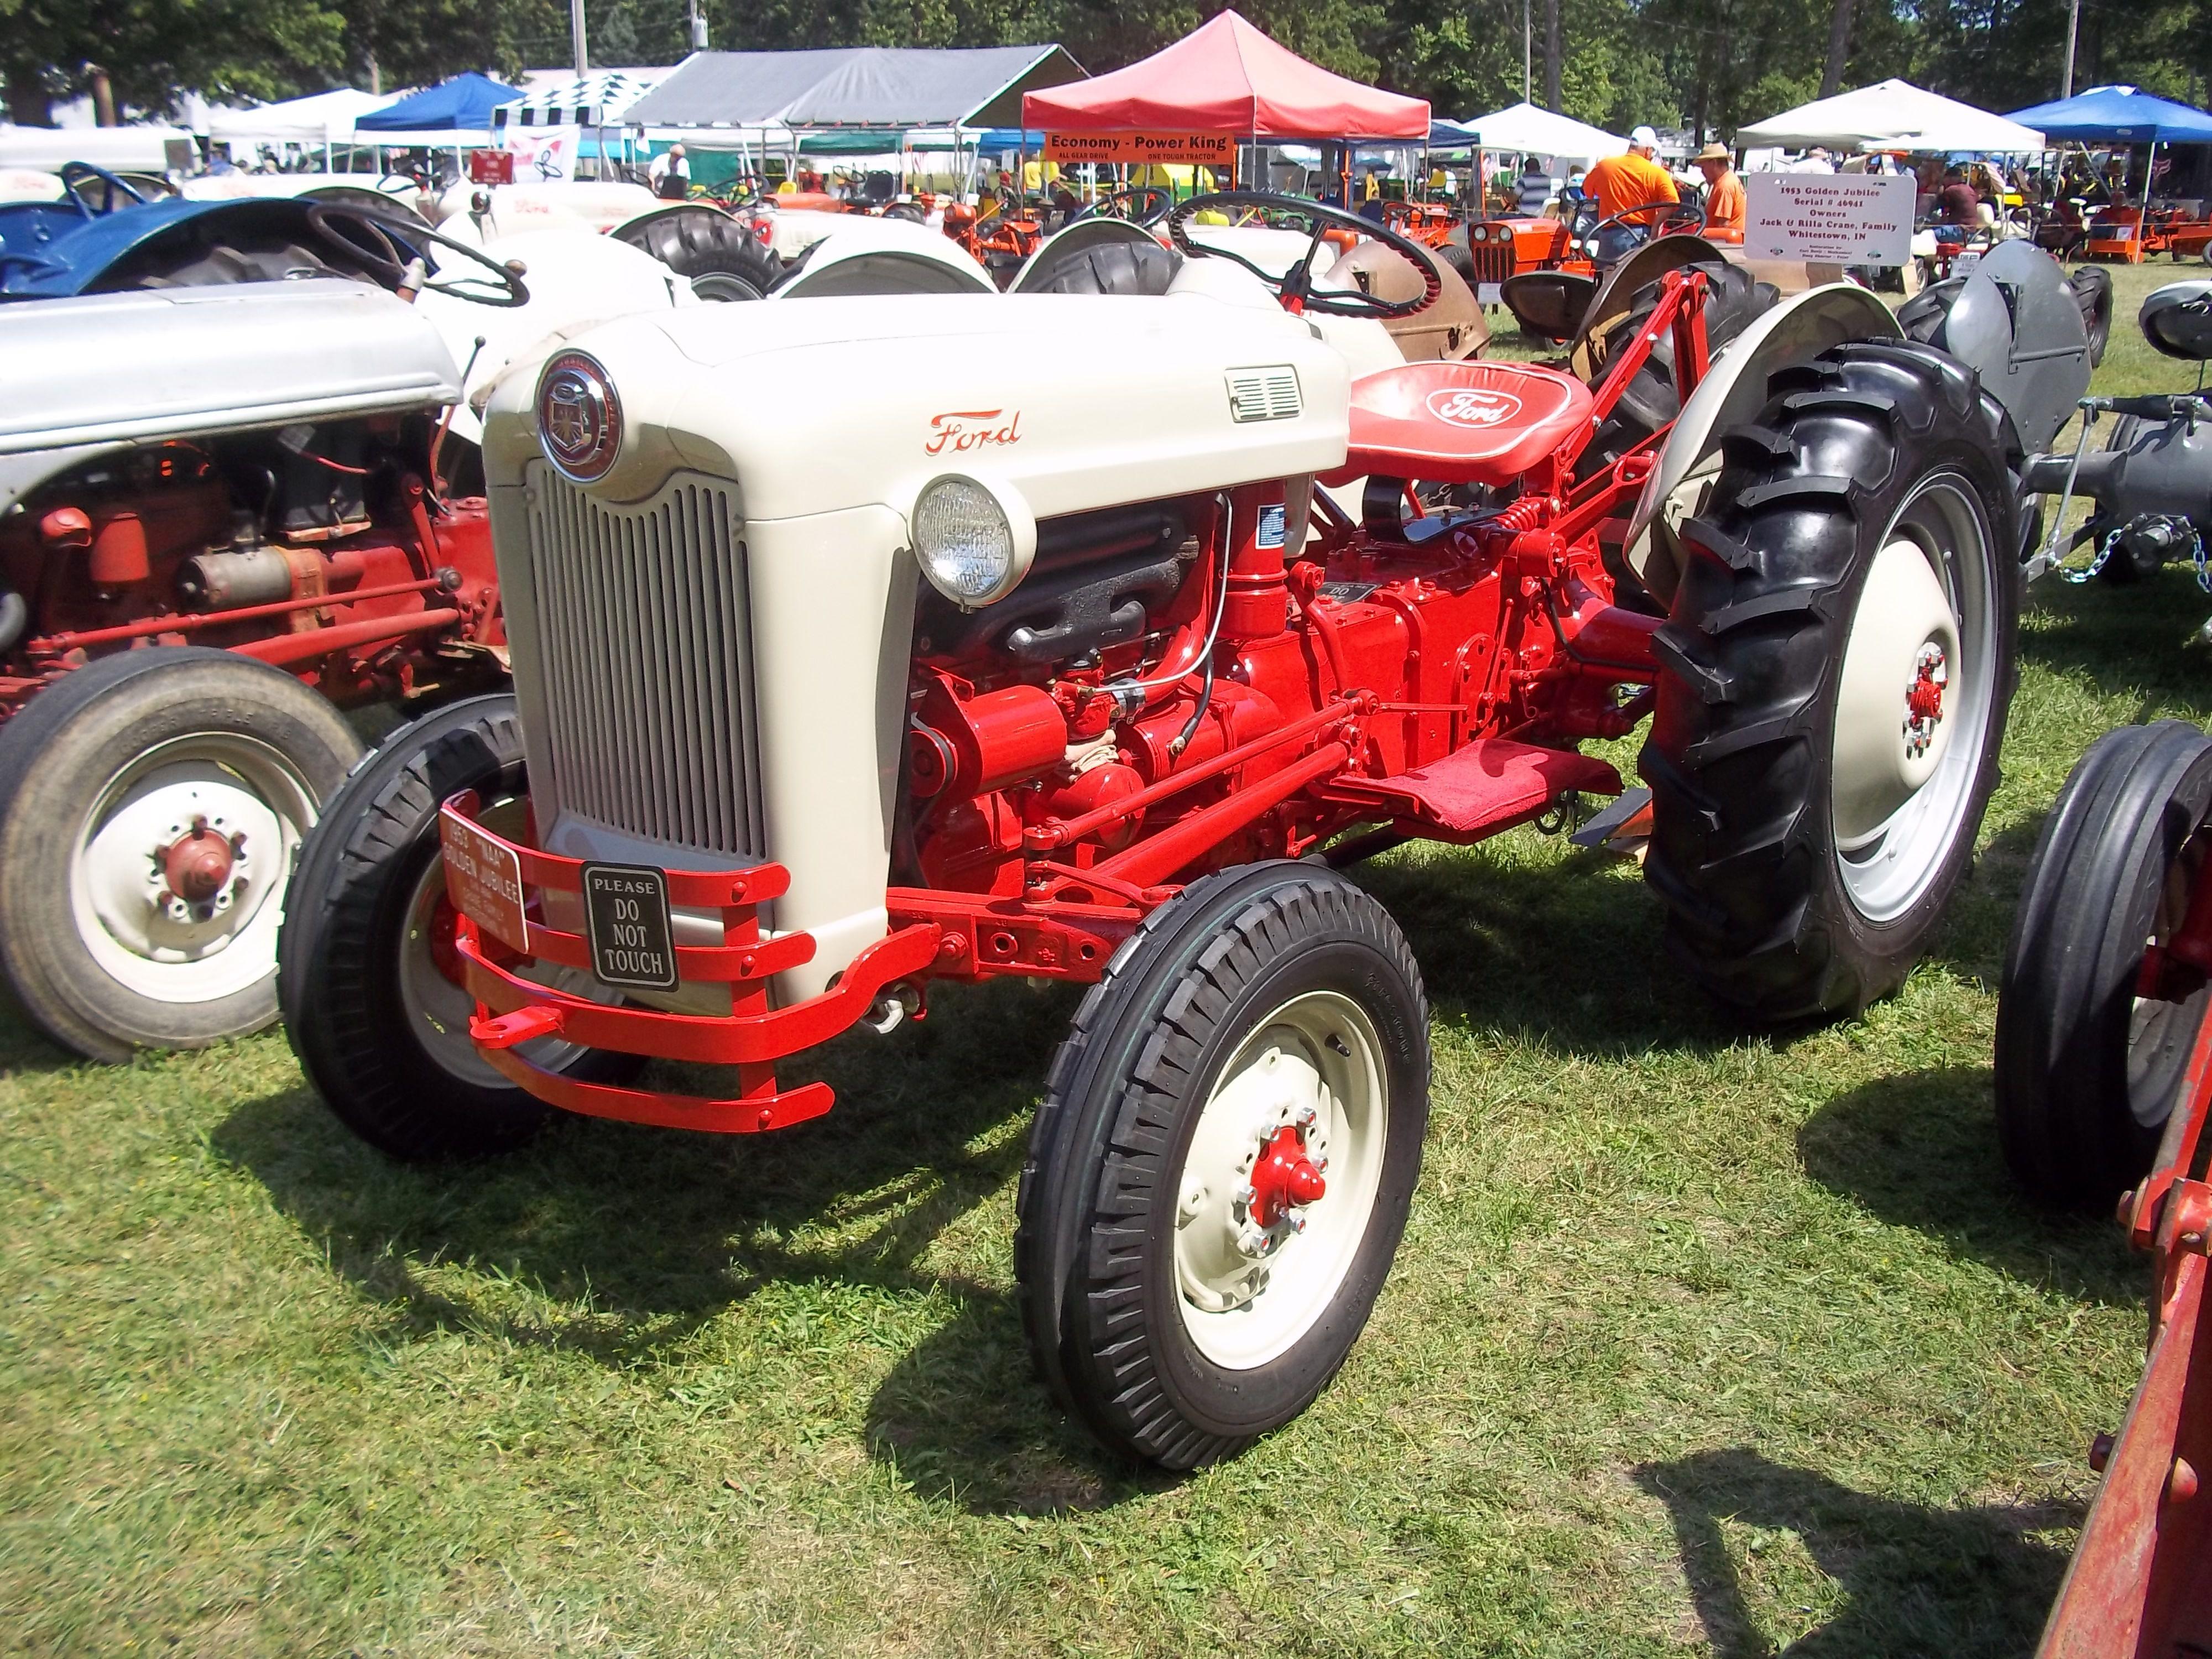 1953 Model Naa Golden Jubilee Ford Tractors Farm Tractor Tractors